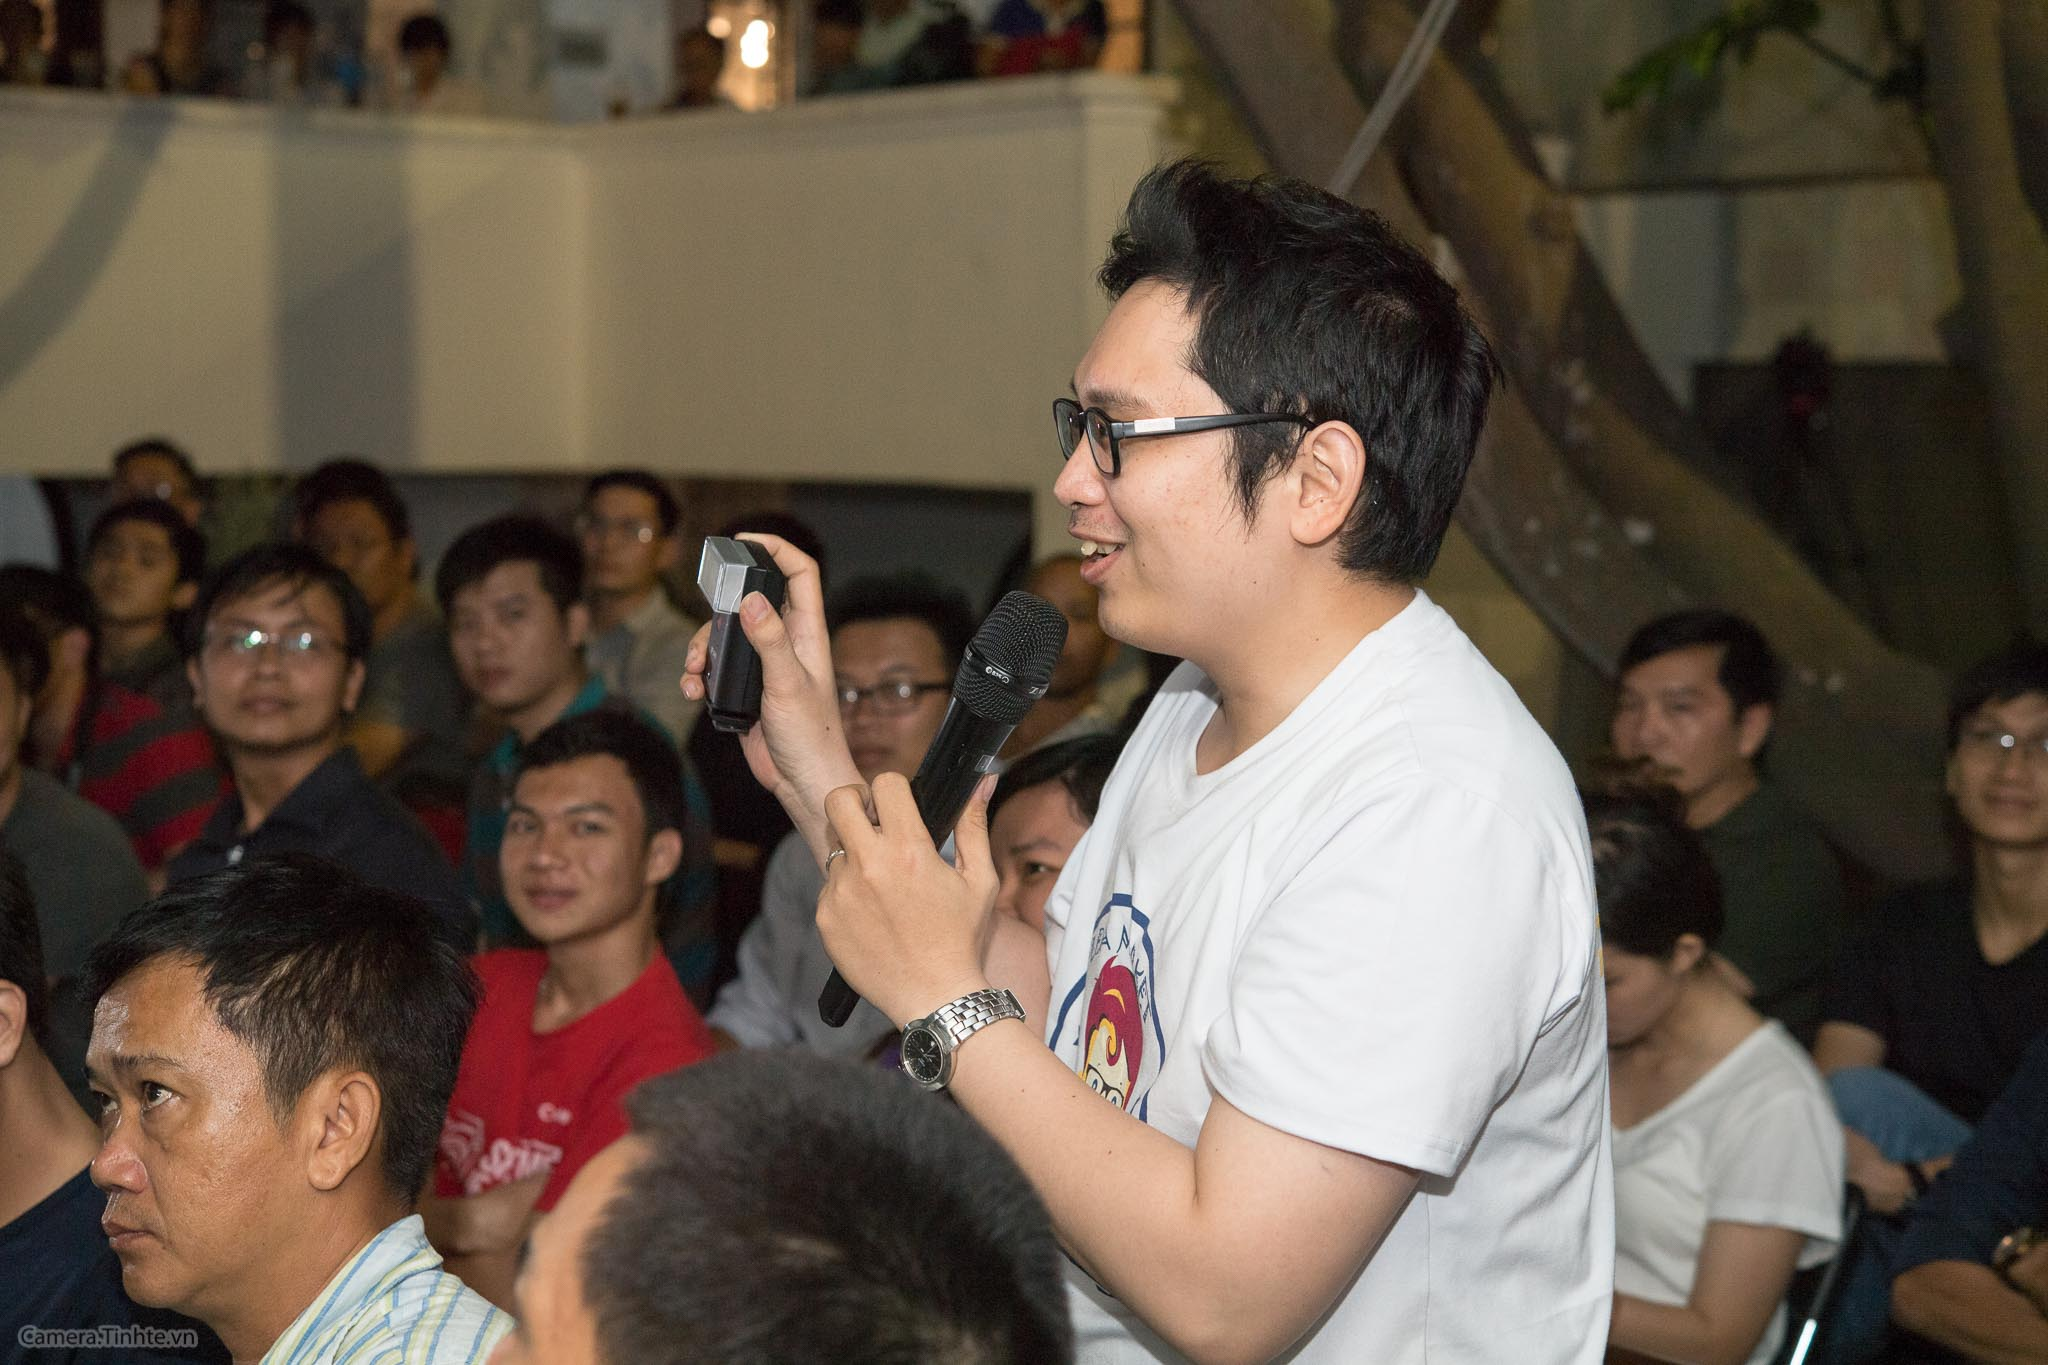 NACB 3 - Flash 2 - Camera.tinhte.vn-9.jpg